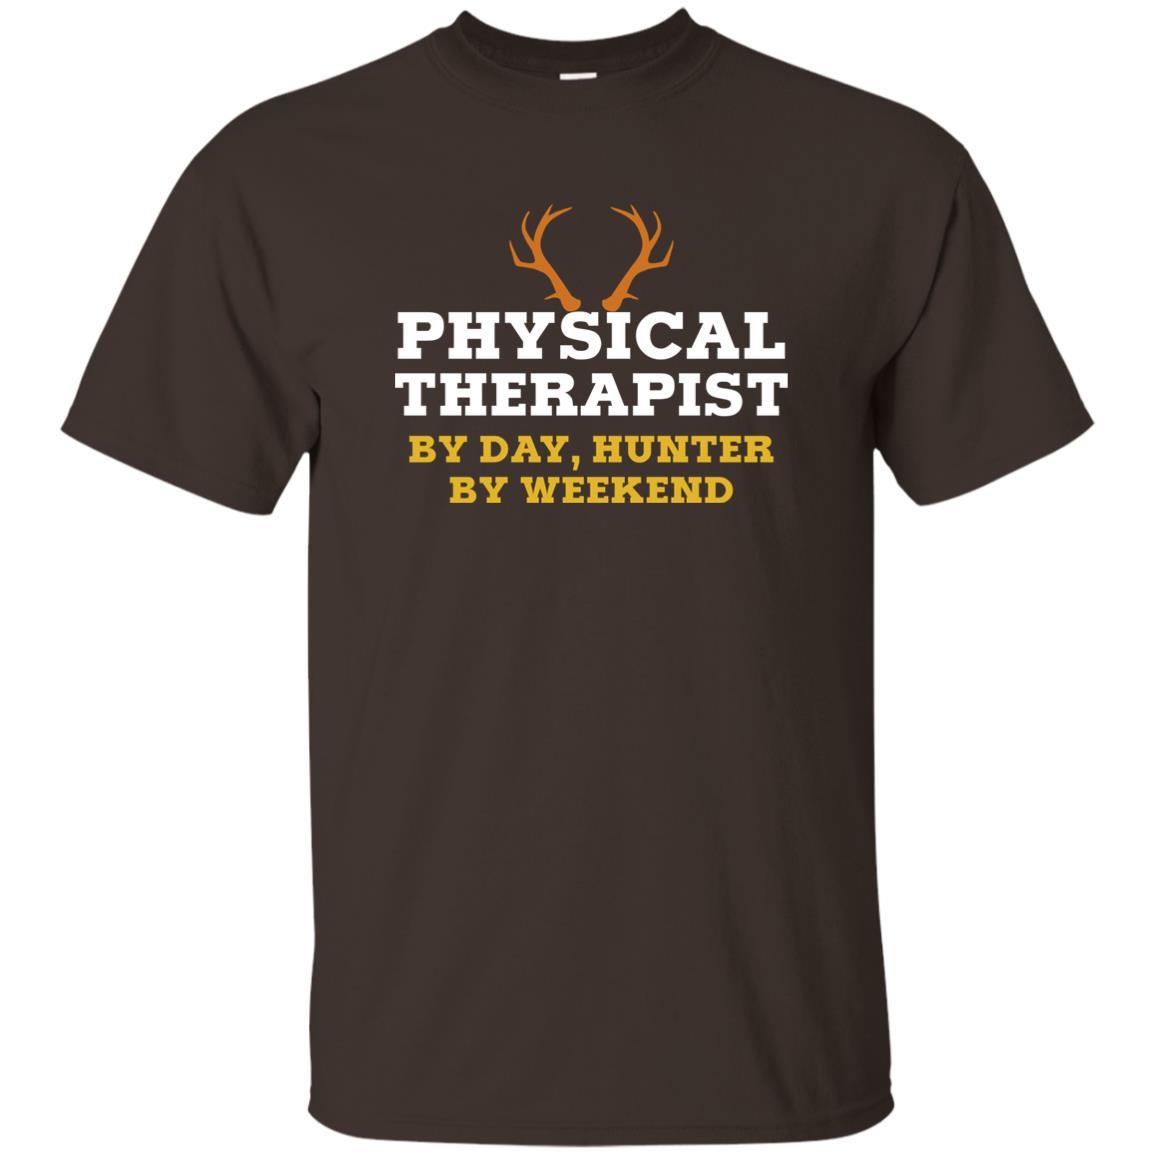 Deer Hunter Physical Therapist Funny Gift Unisex Short Sleeve